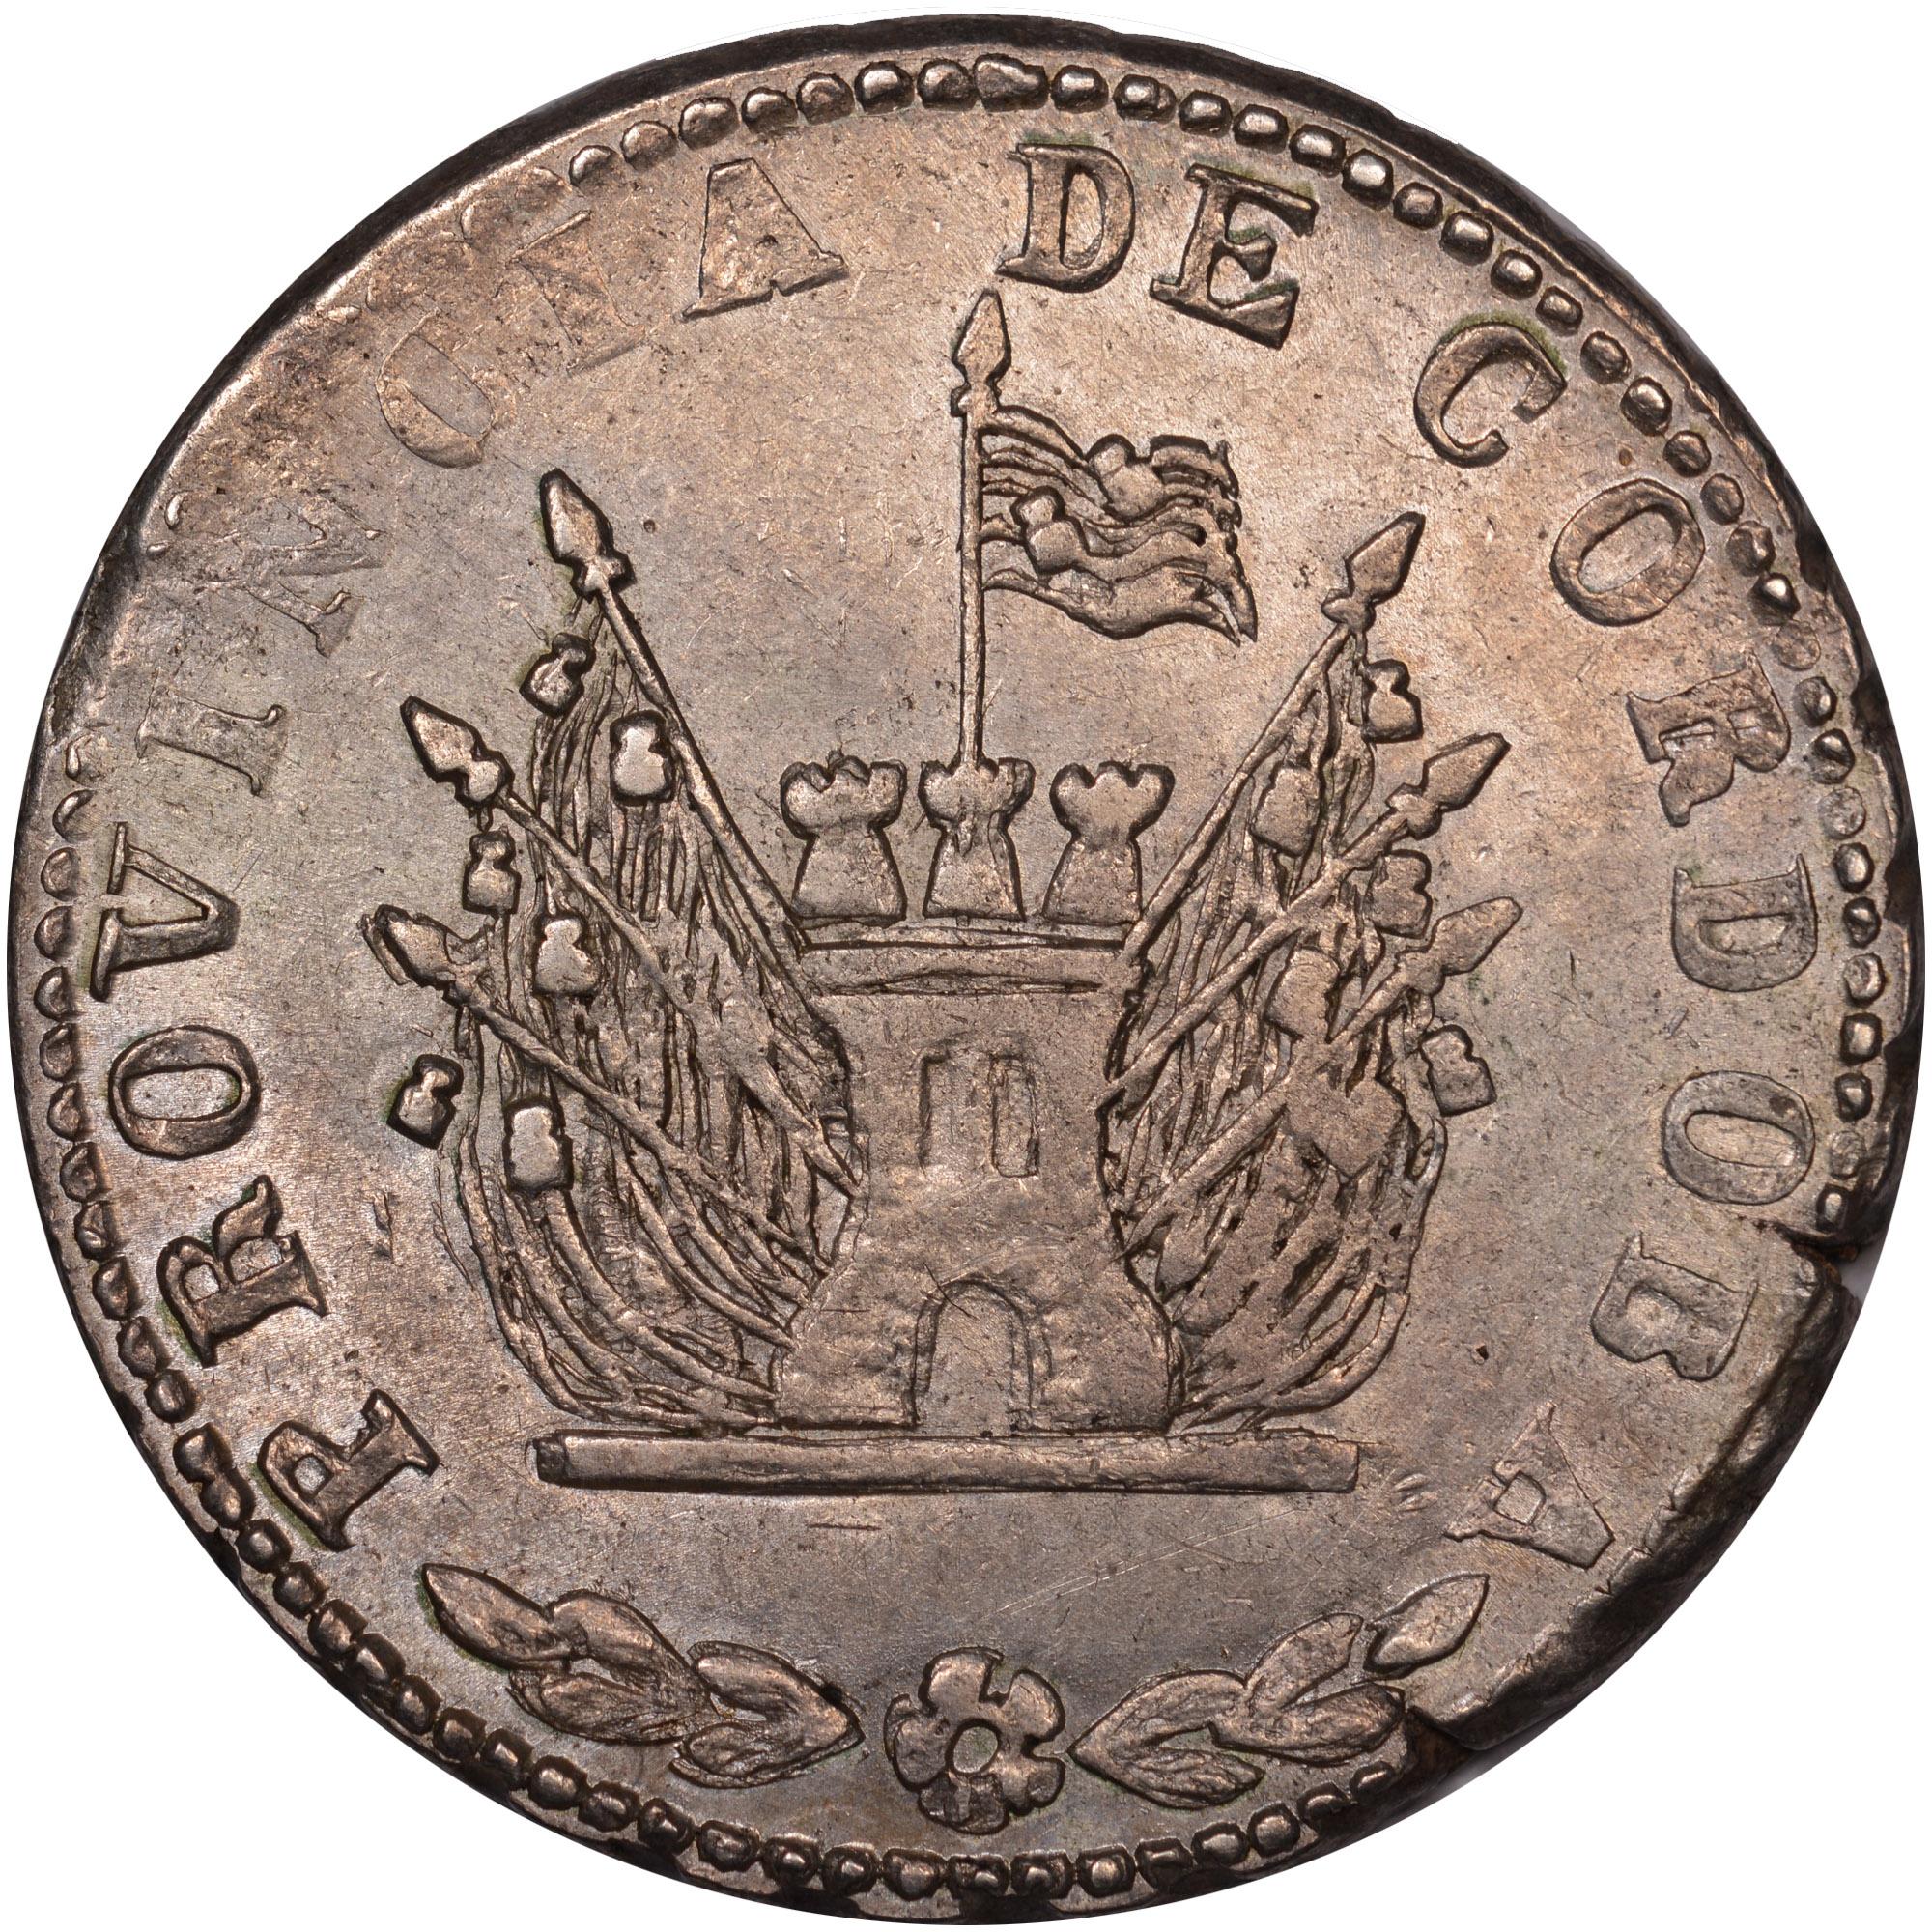 1846-1851 Argentina CORDOBA 4 Reales obverse